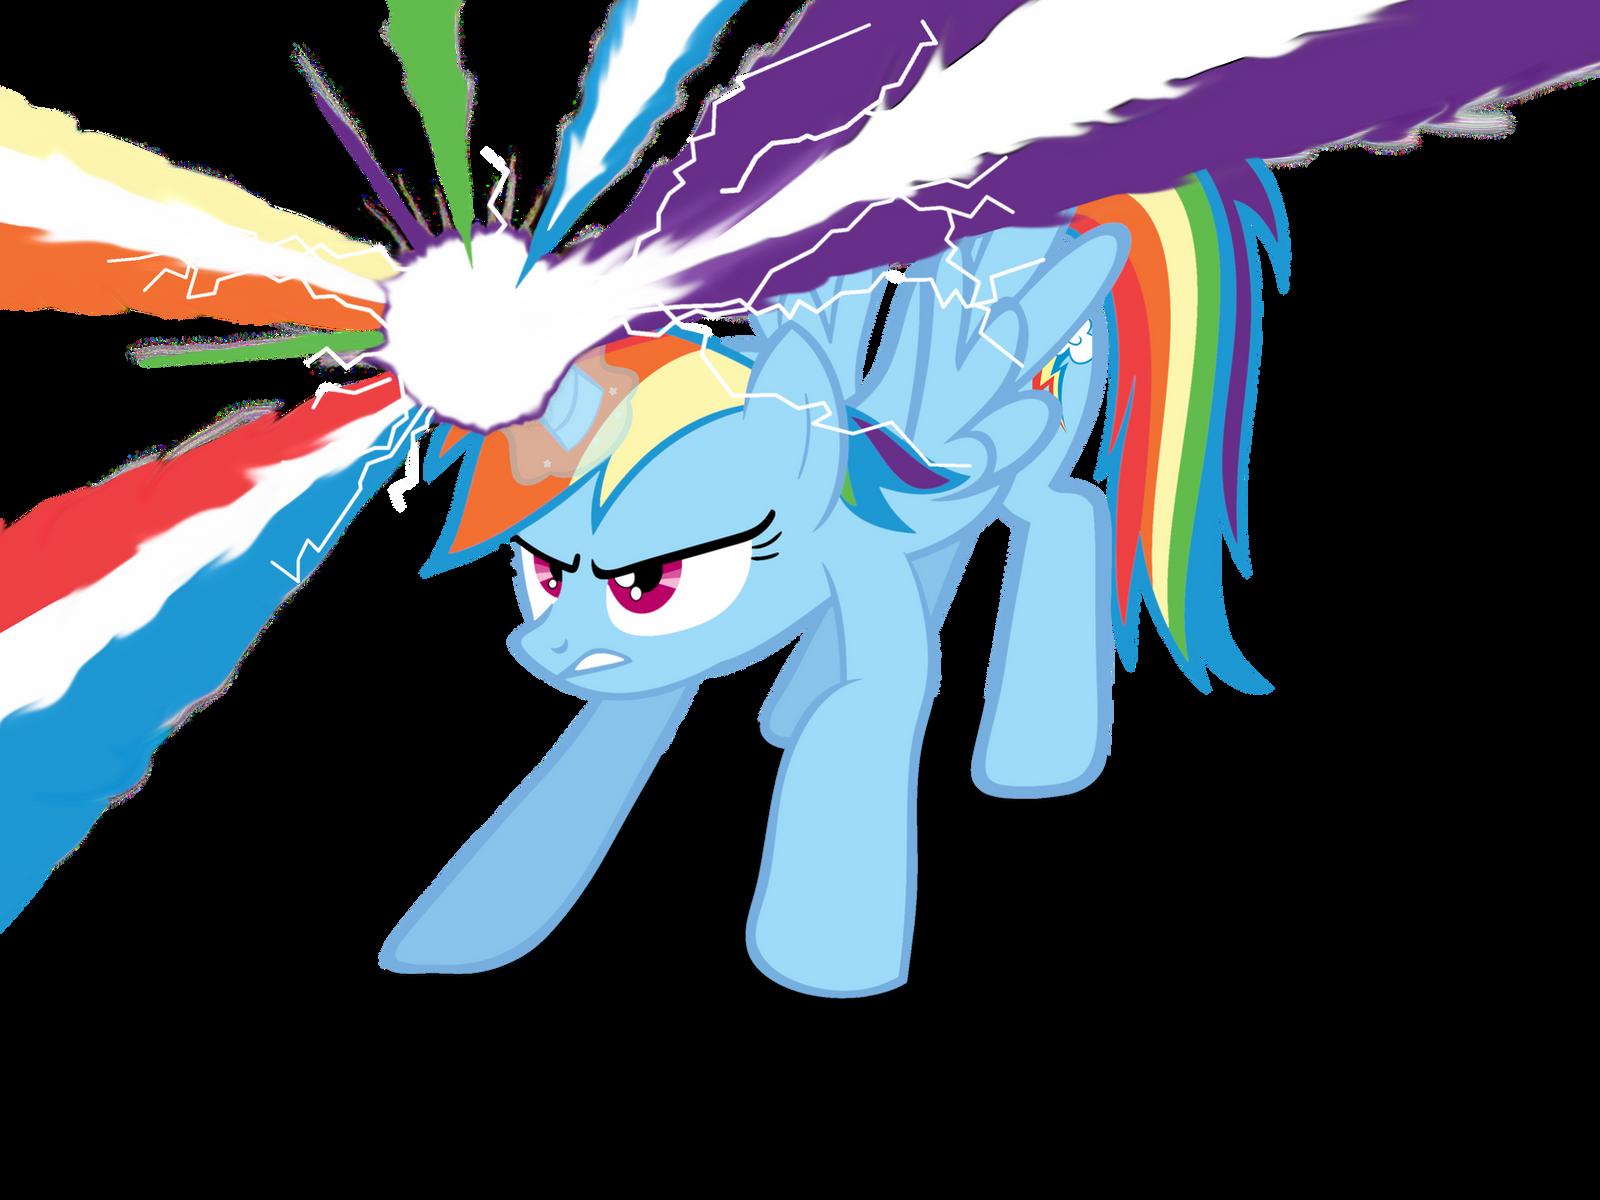 If Rainbow Dash was an Alicorn... by Neriani on DeviantArt